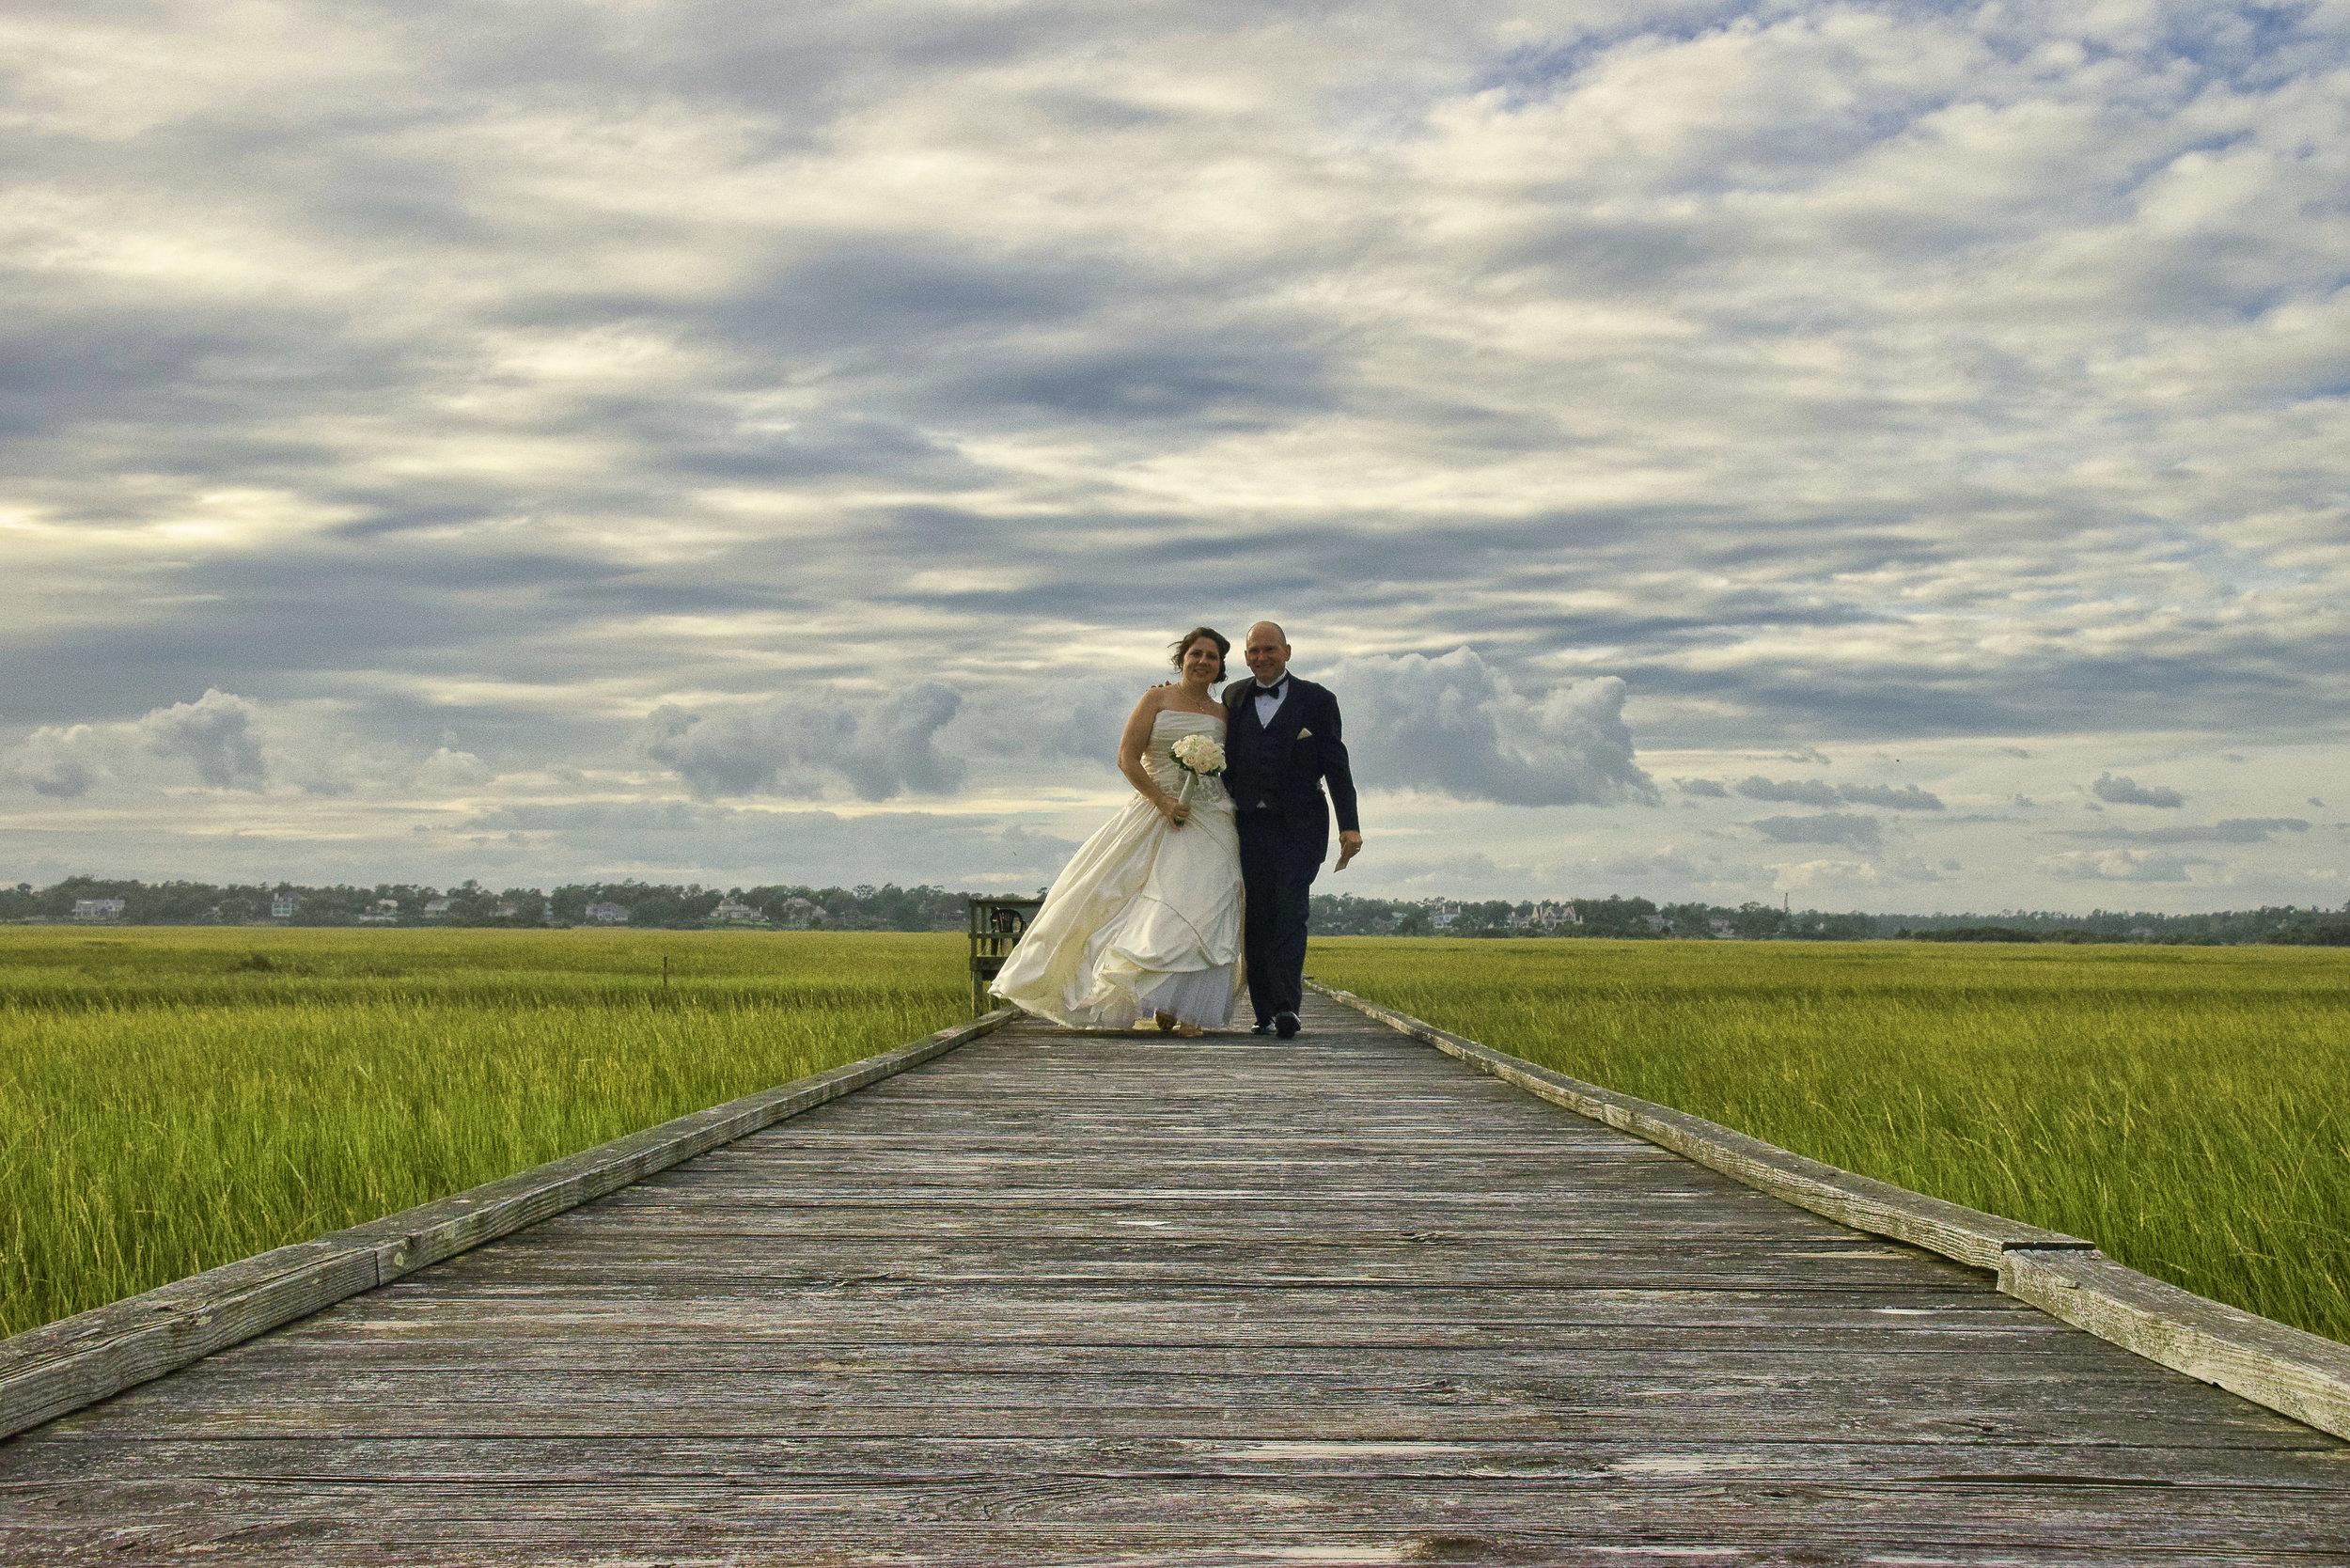 Bride and groom on boardwalk.